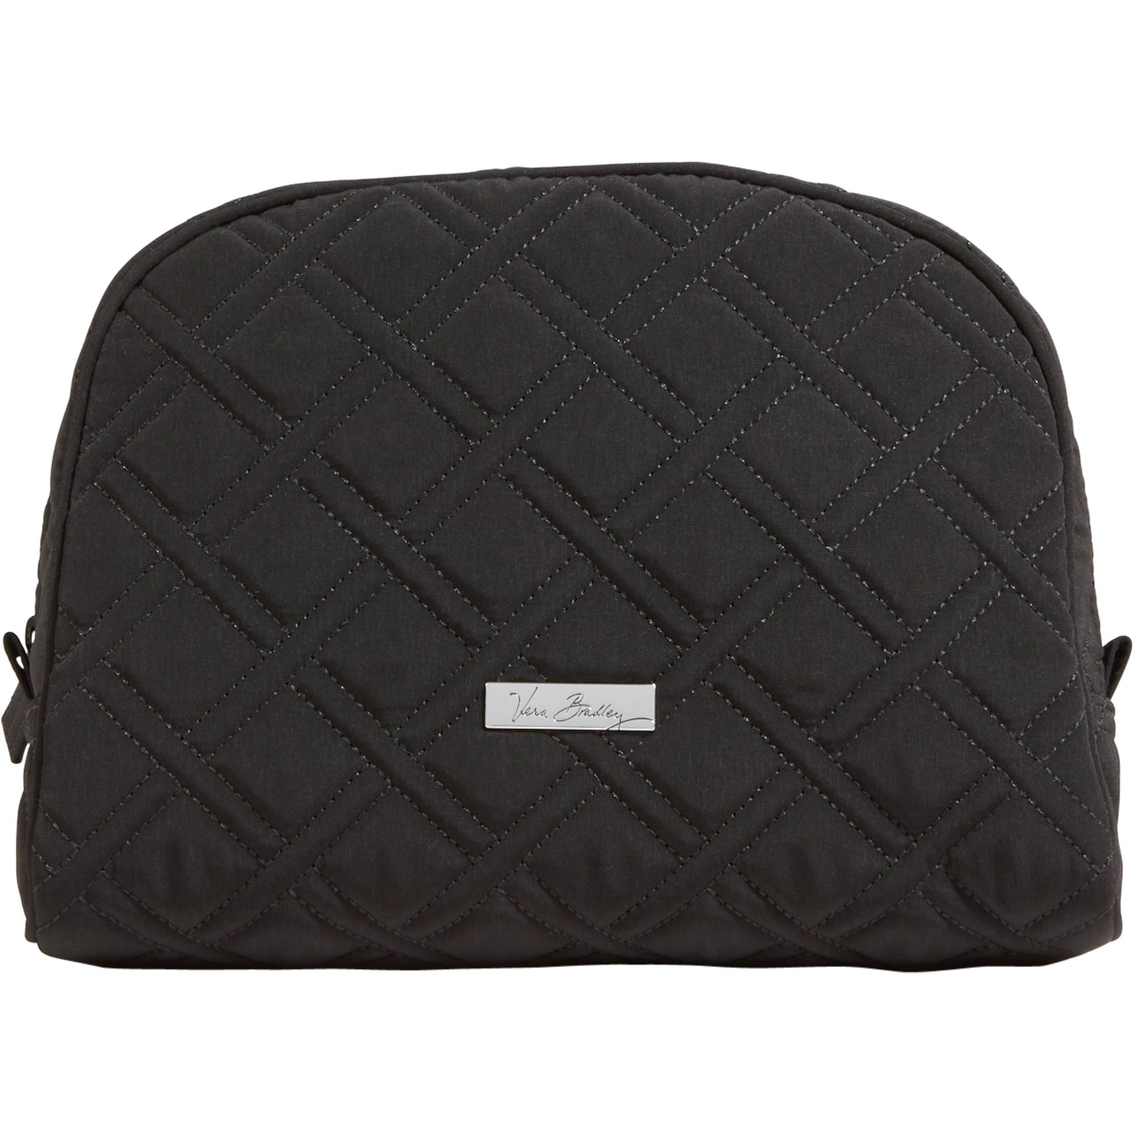 Vera Bradley Large Zip Cosmetics Bag Classic Black Shop By Pattern Shop The Exchange